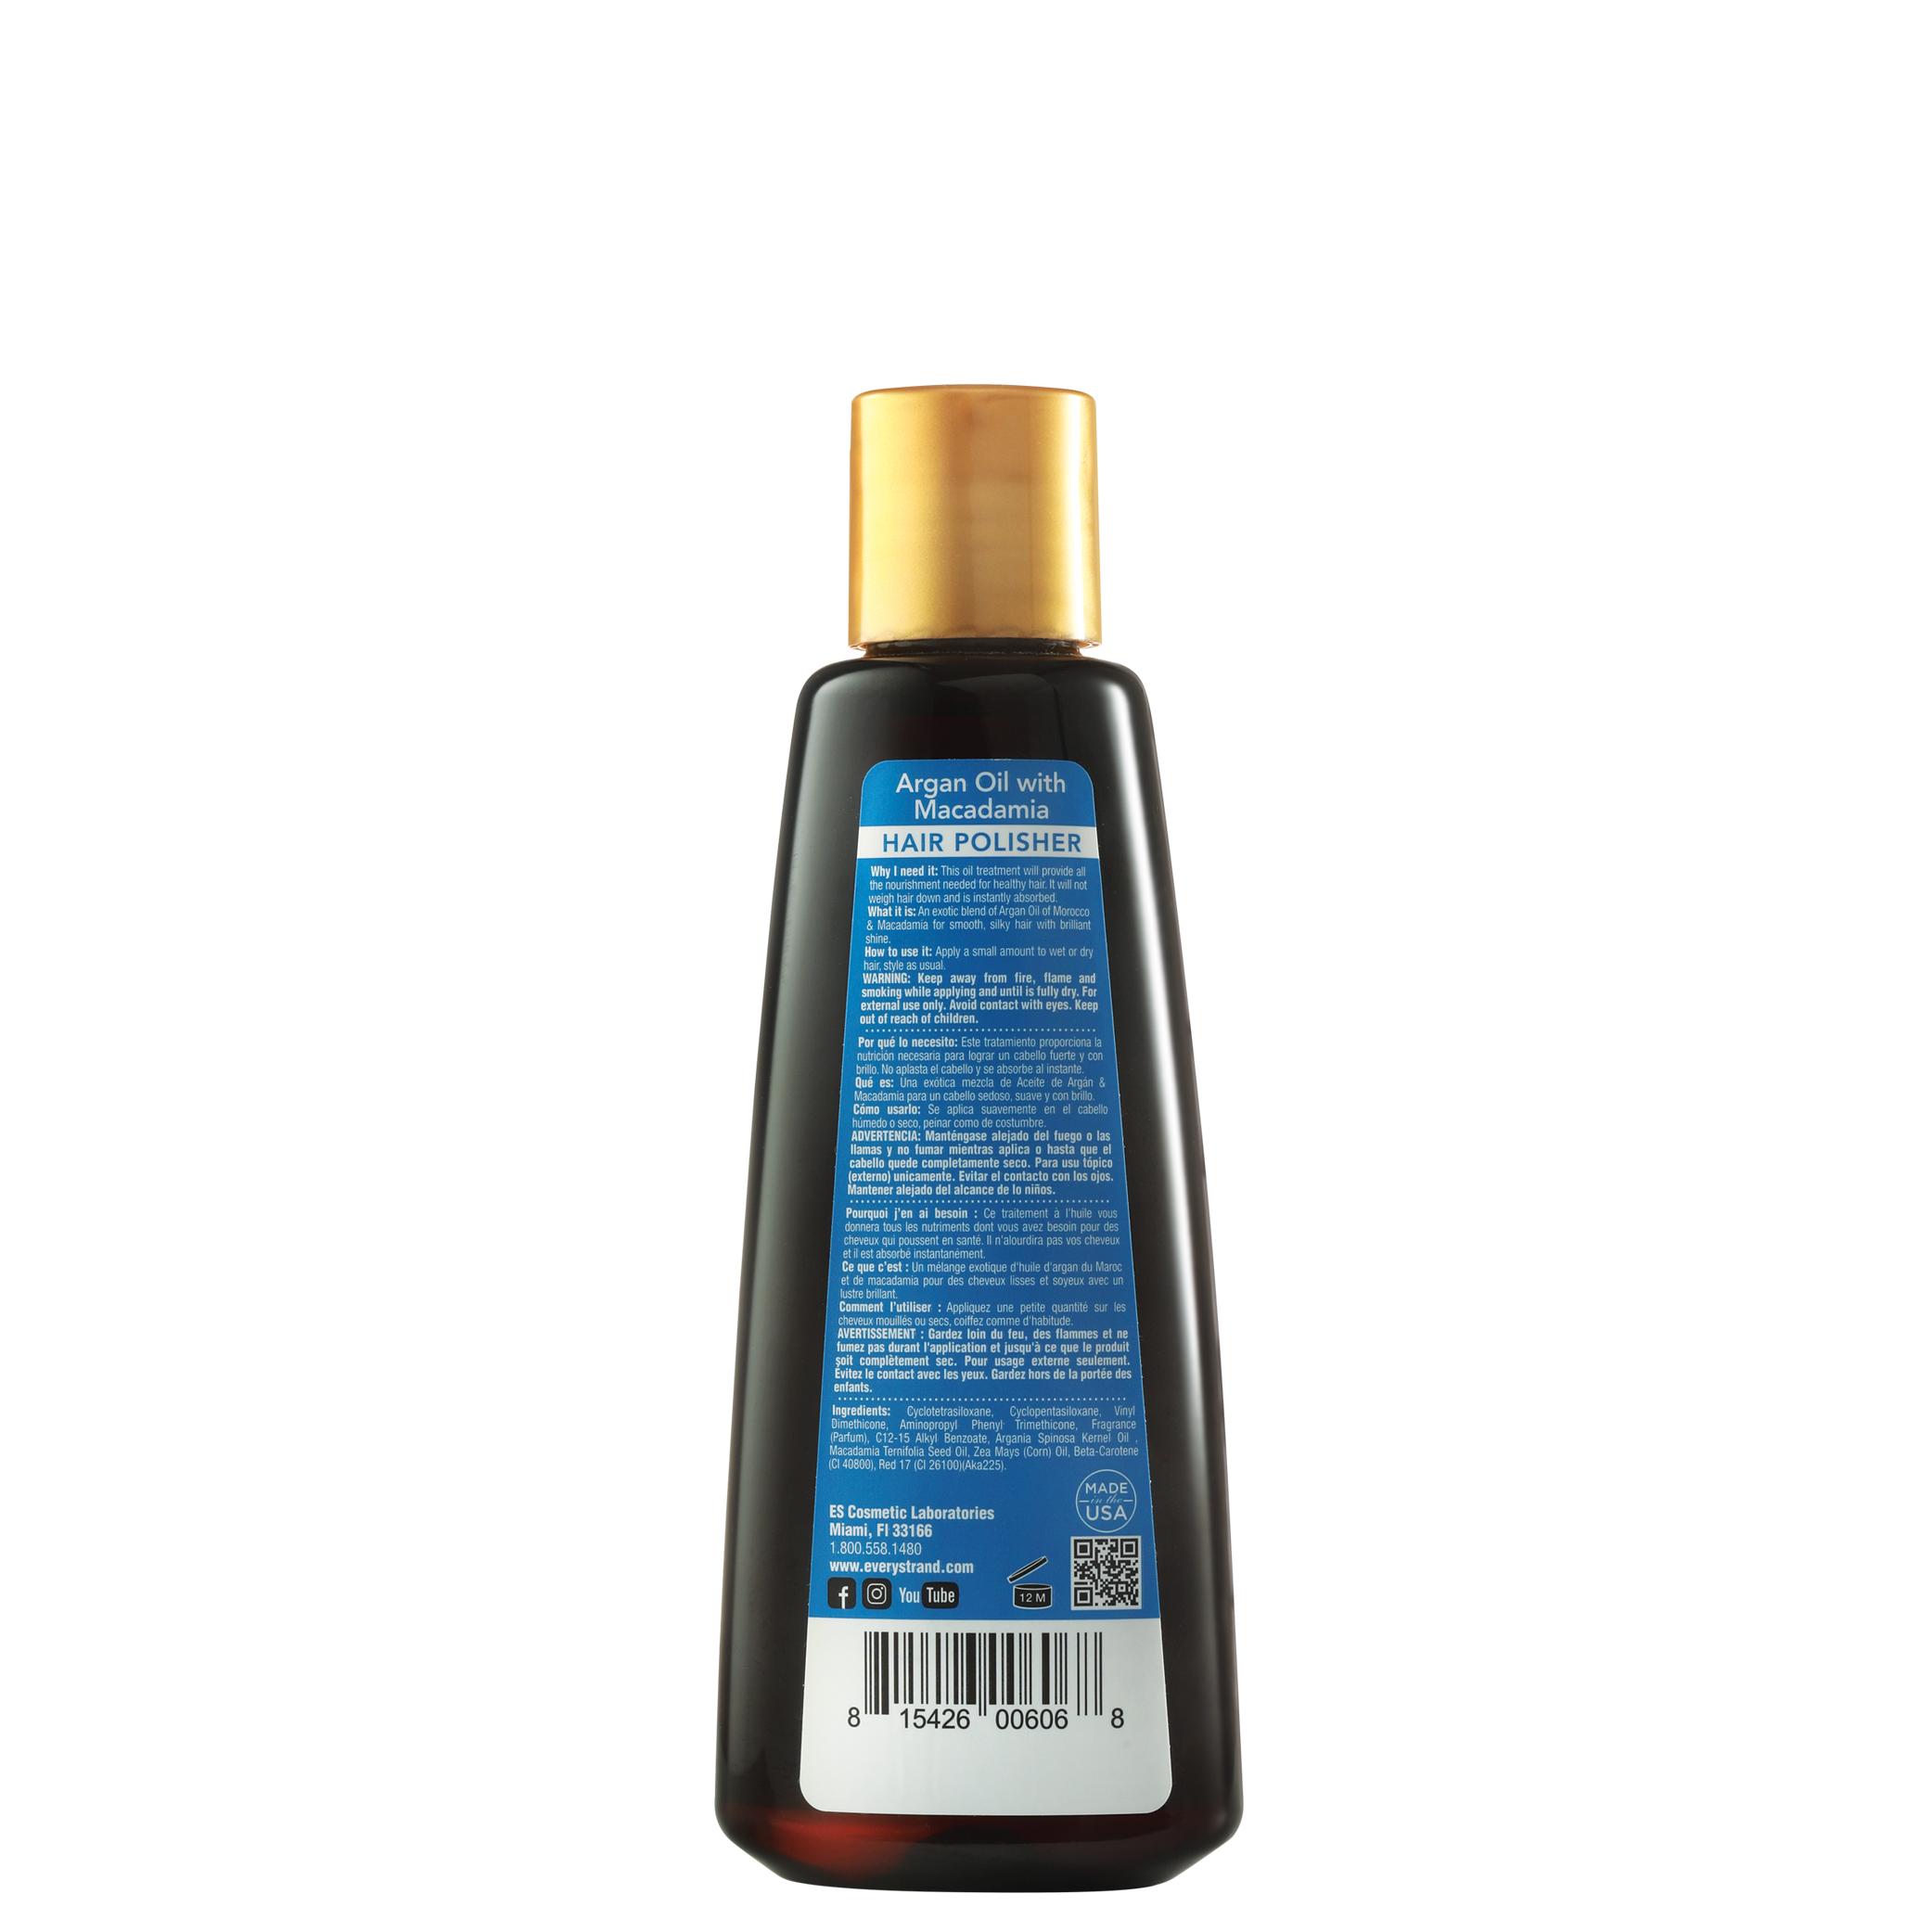 Argan Oil with Macadamia Hair Polisher — Every Strand New